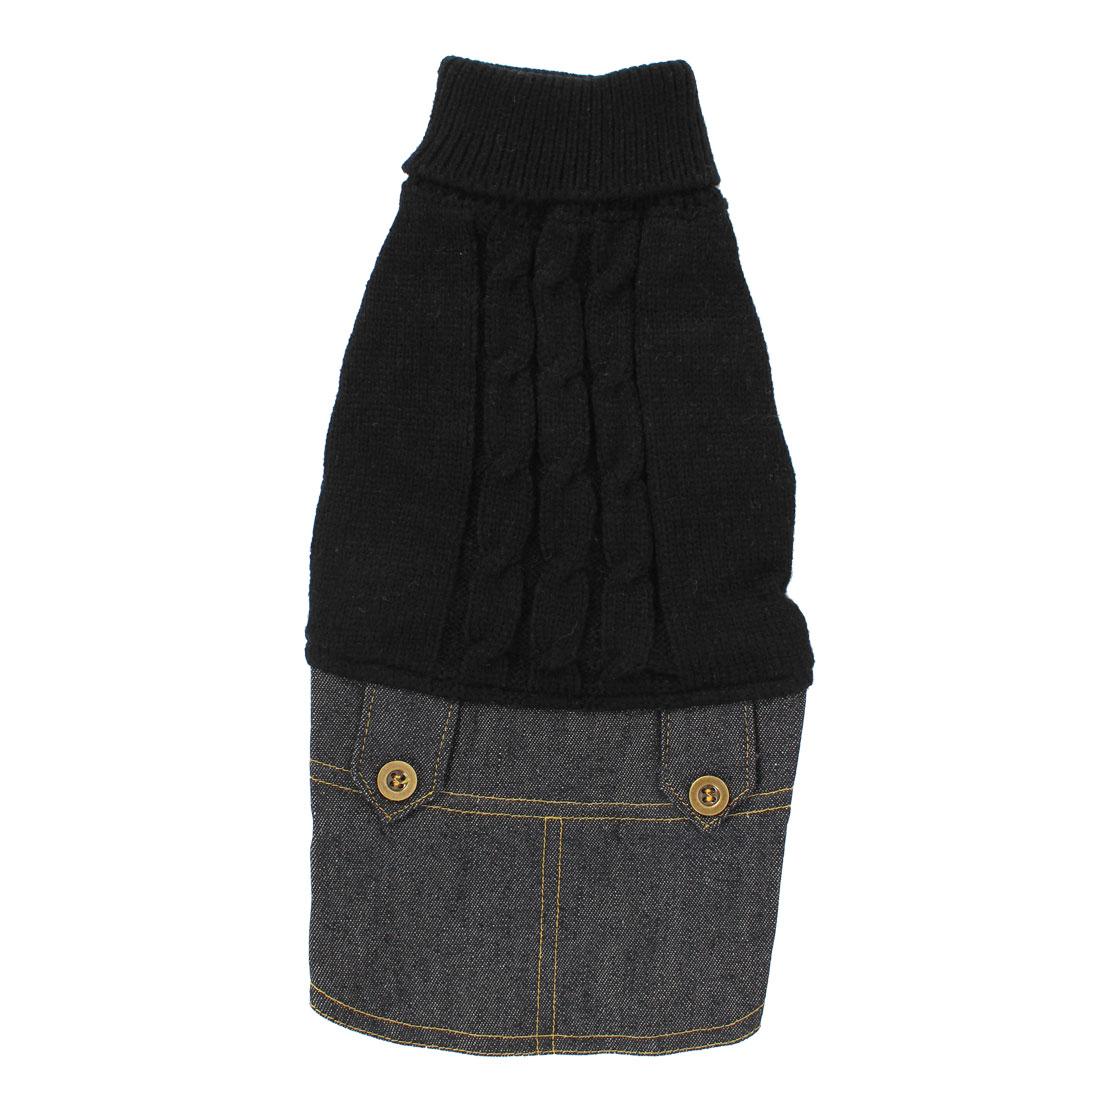 Pet Dog Winter Warm Sweater Denim Dress Jeans Skirt Clothes Apparel Black M